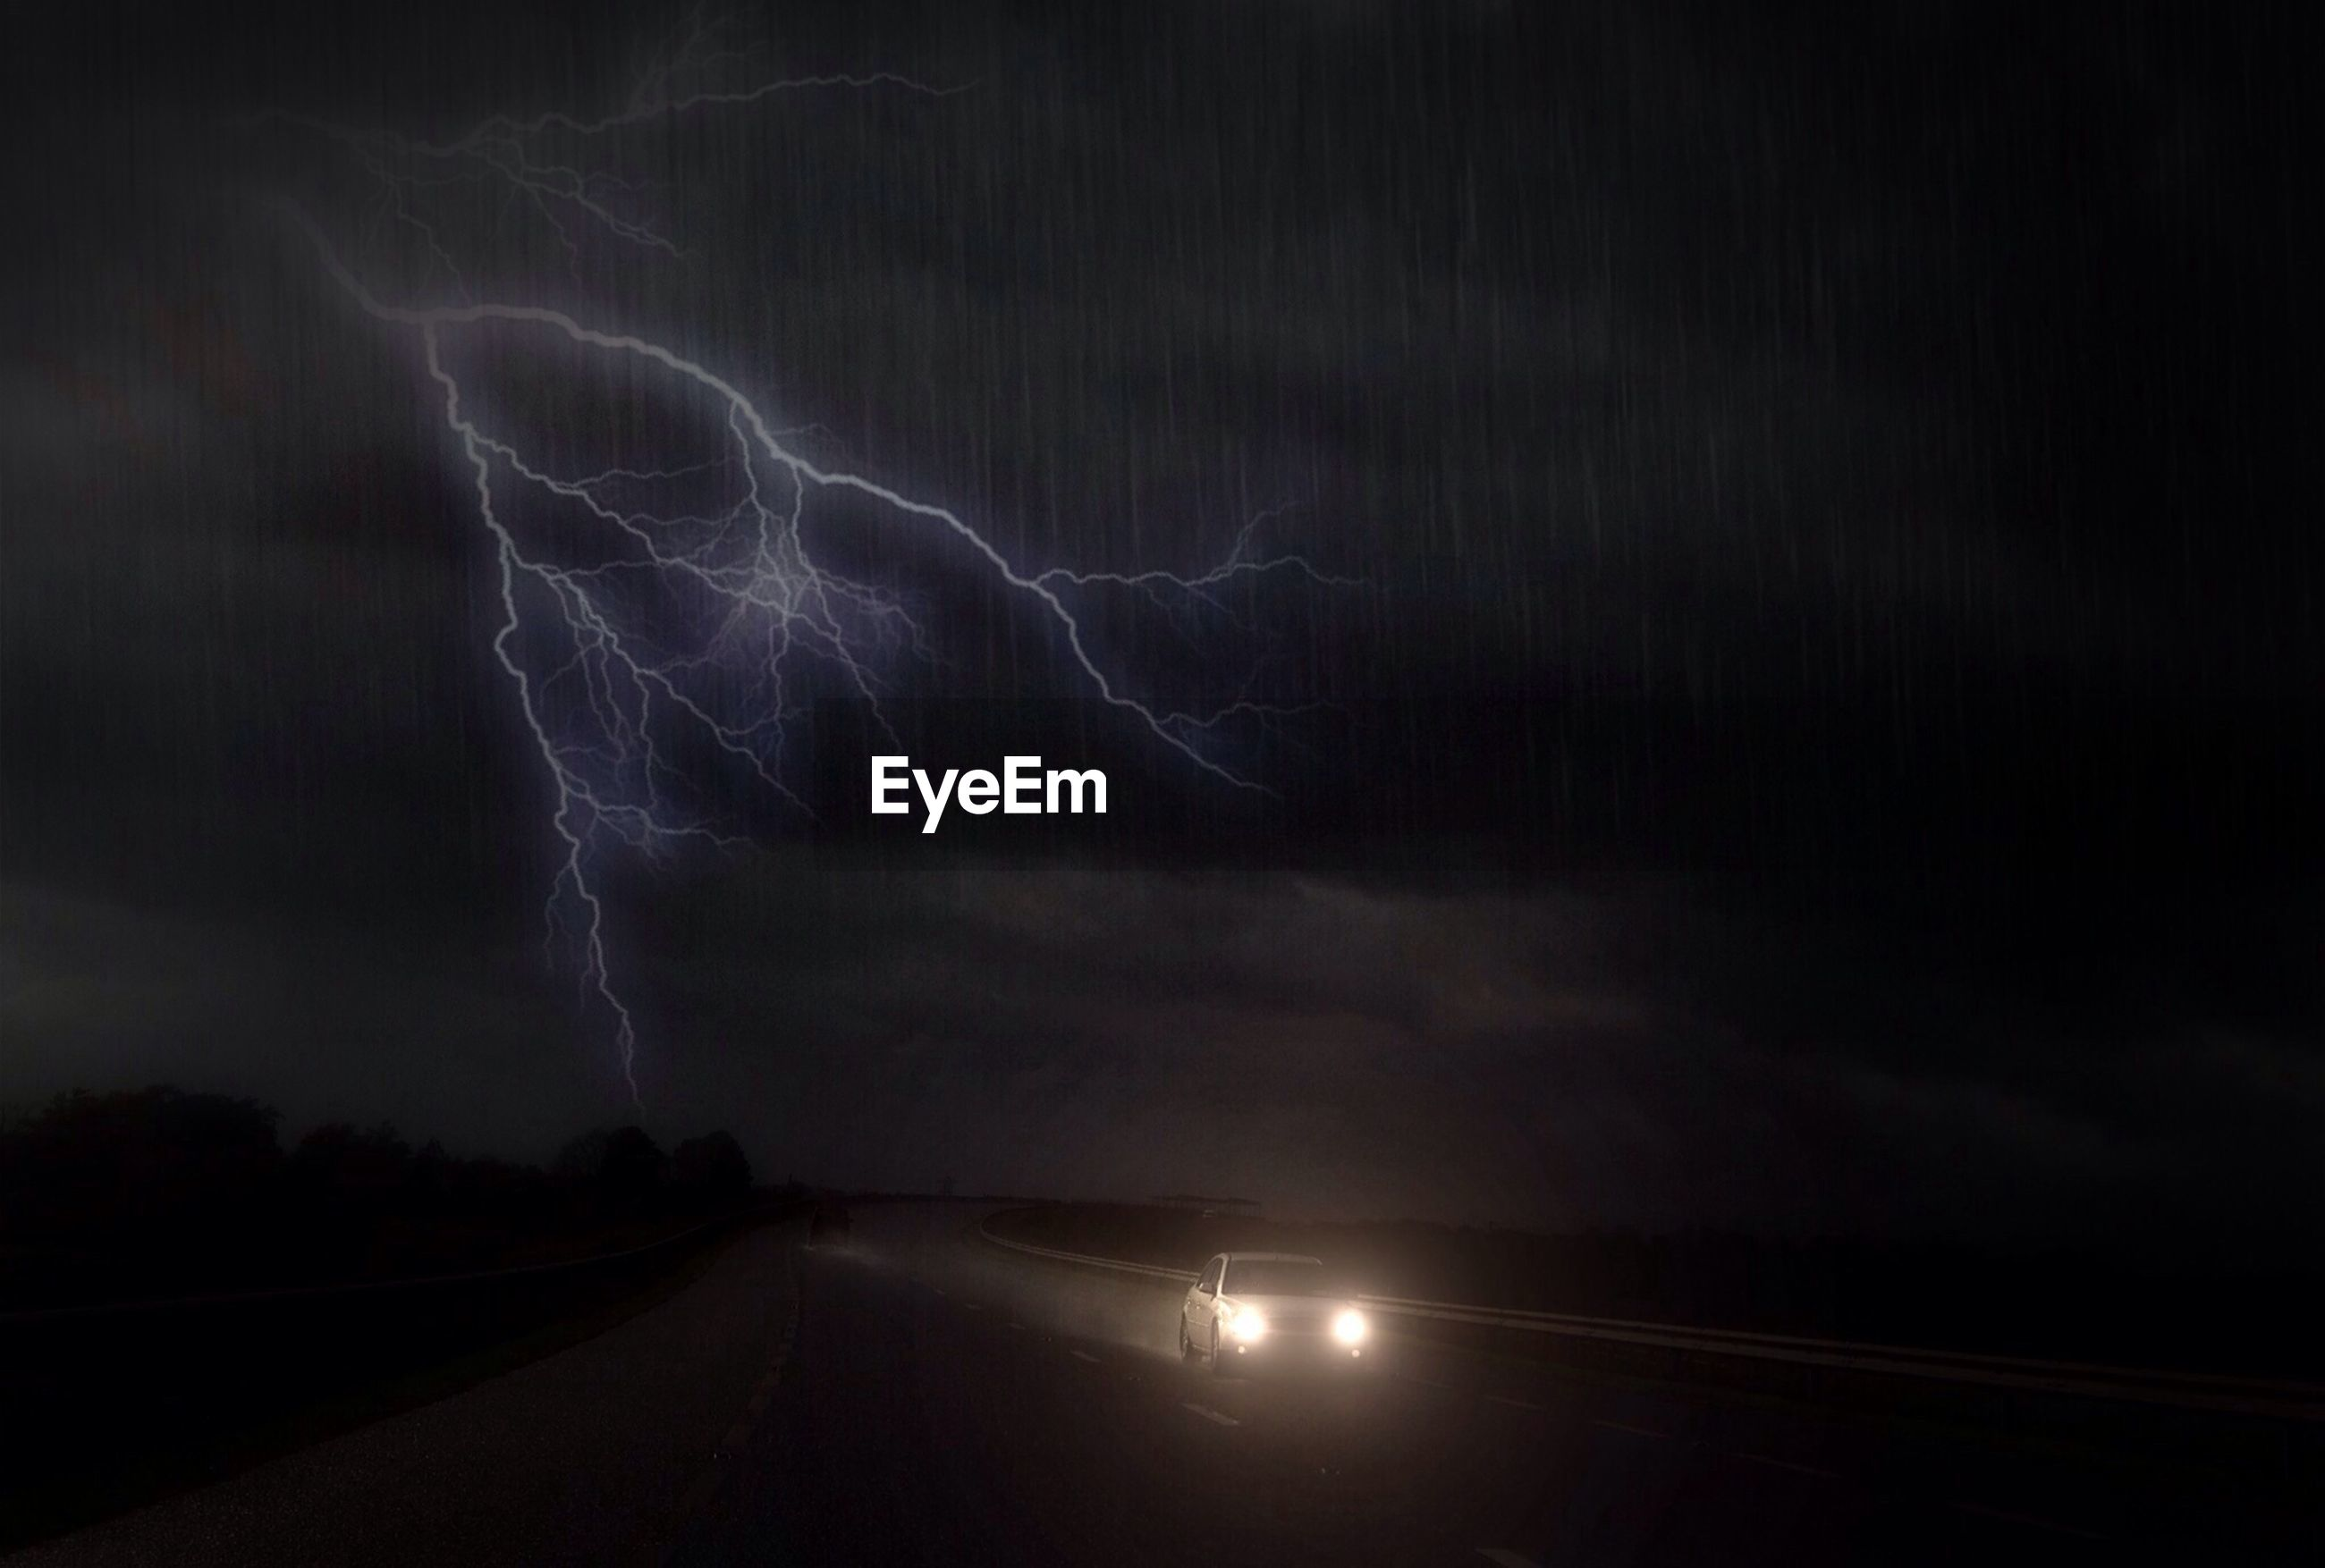 VIEW OF ROAD AT NIGHT